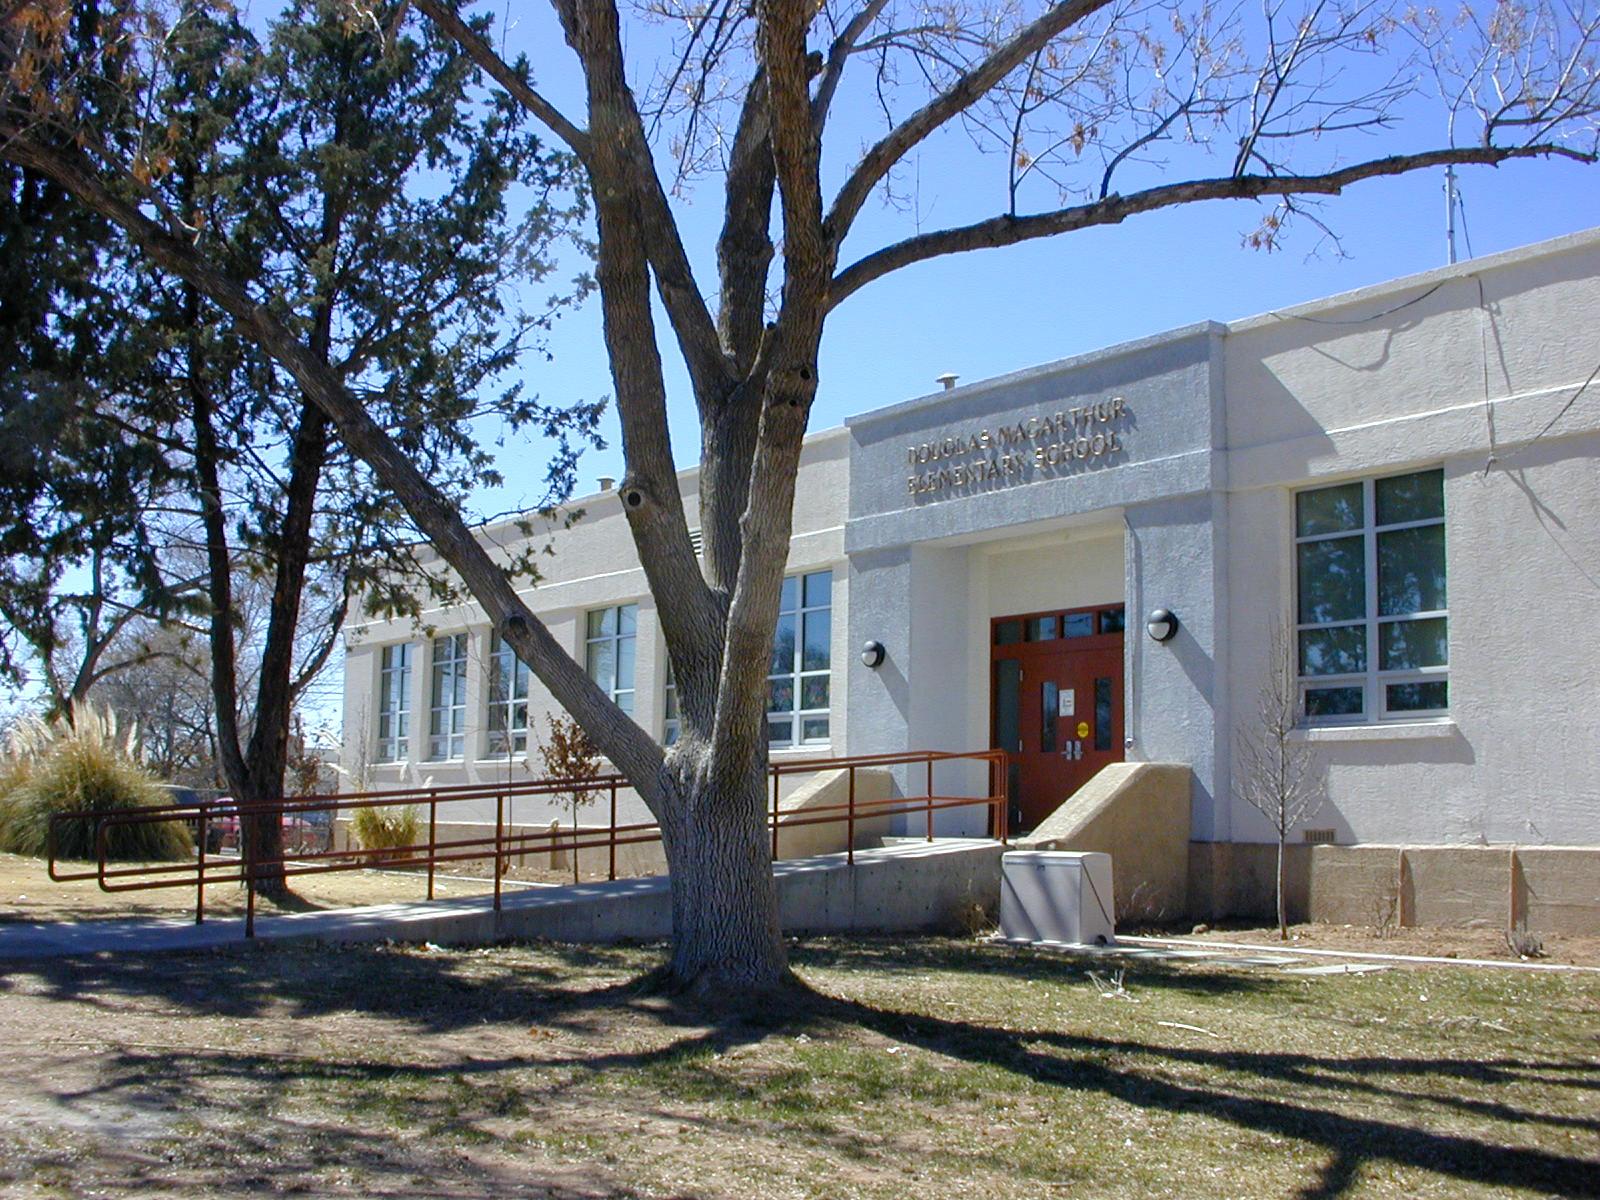 MacArthur_Elementary_School_01.jpg